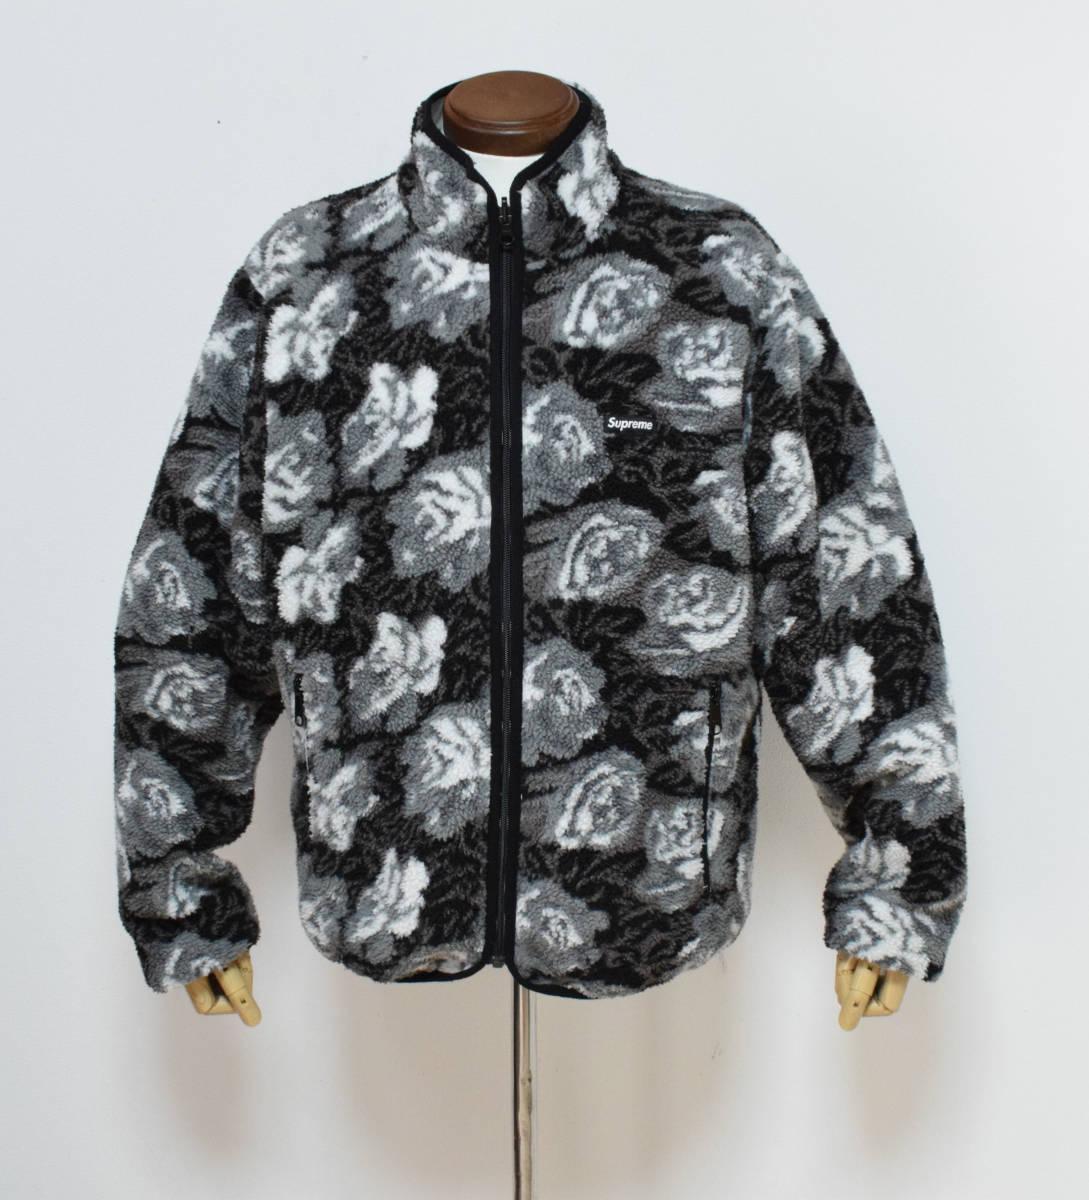 16aw supreme シュプリーム Roses Sherpa Fleece Reversible Jacket ローズシェルパ フリース リバーシブル ジャケット M //